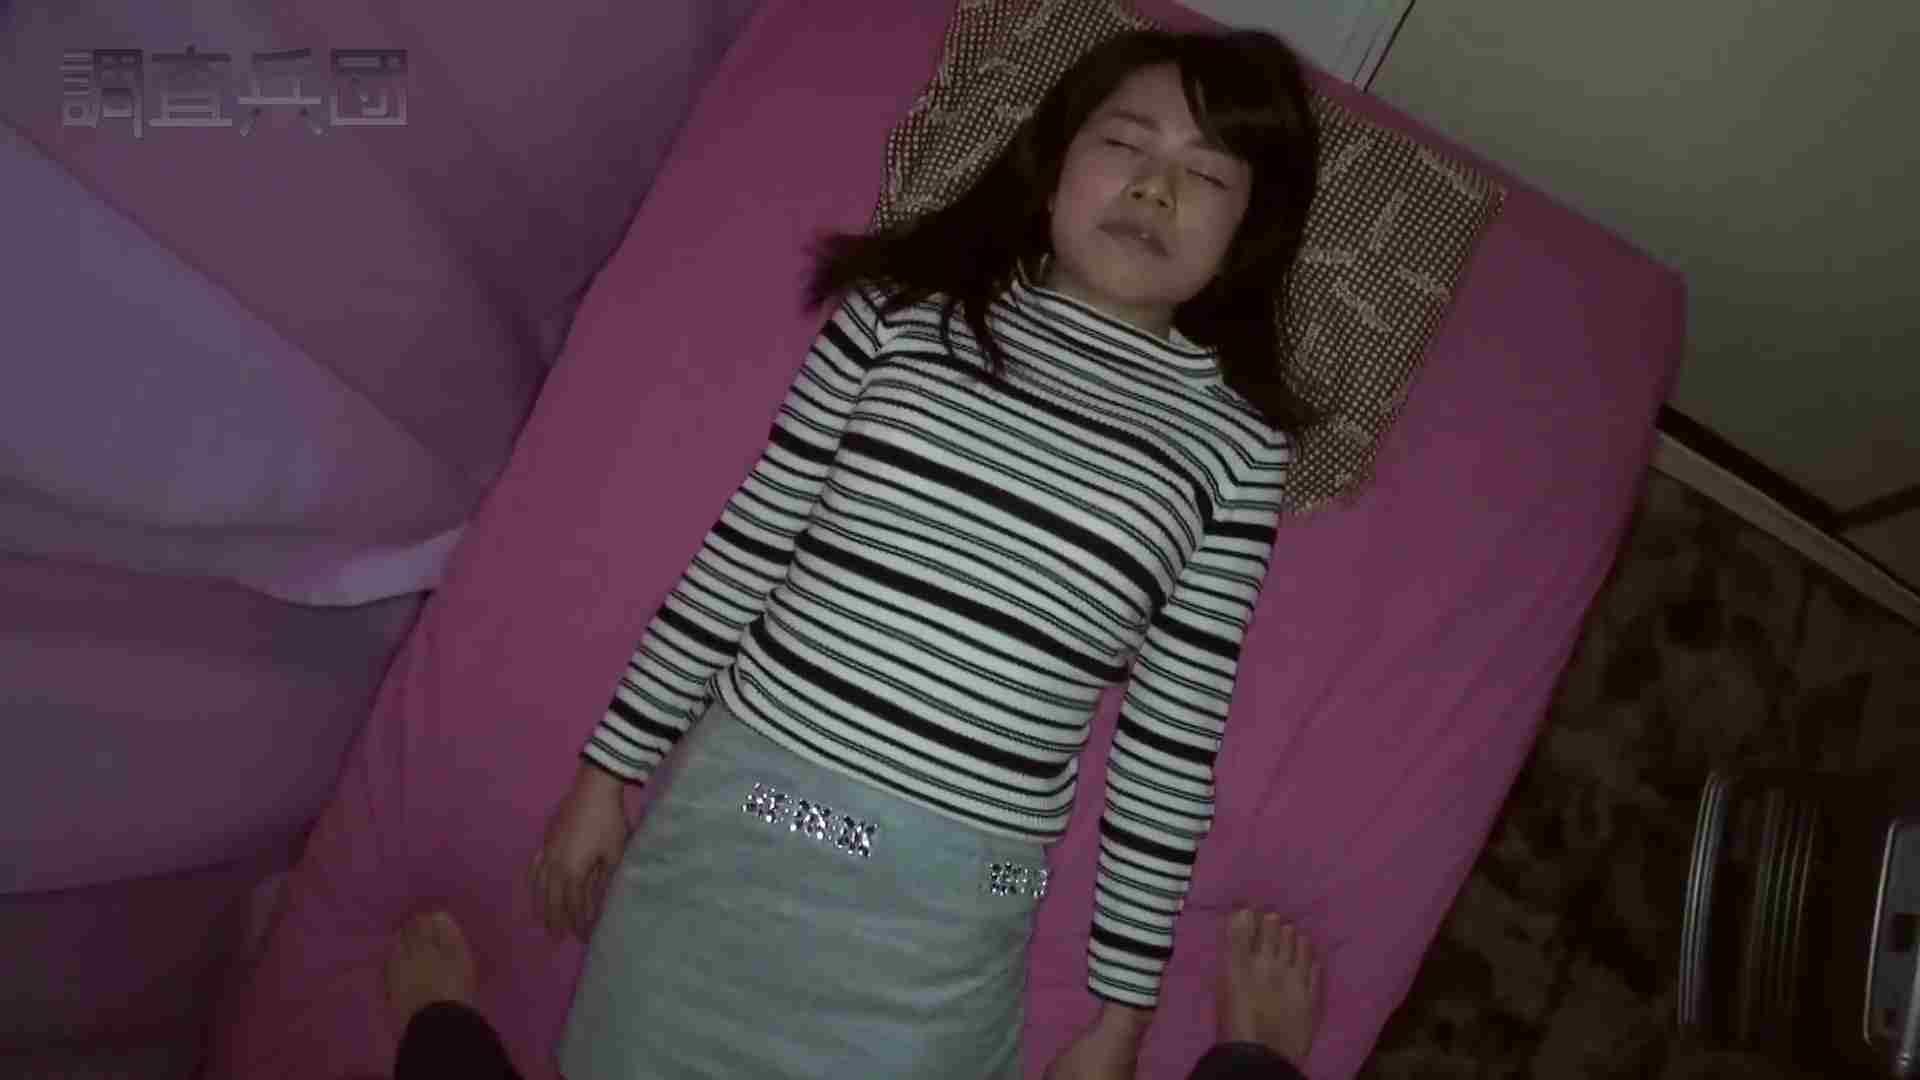 RE:~反撃の悪戯~vol.9 帰国子女の才女・みほ【前編】 いじくり   お姉さん攻略  57画像 1